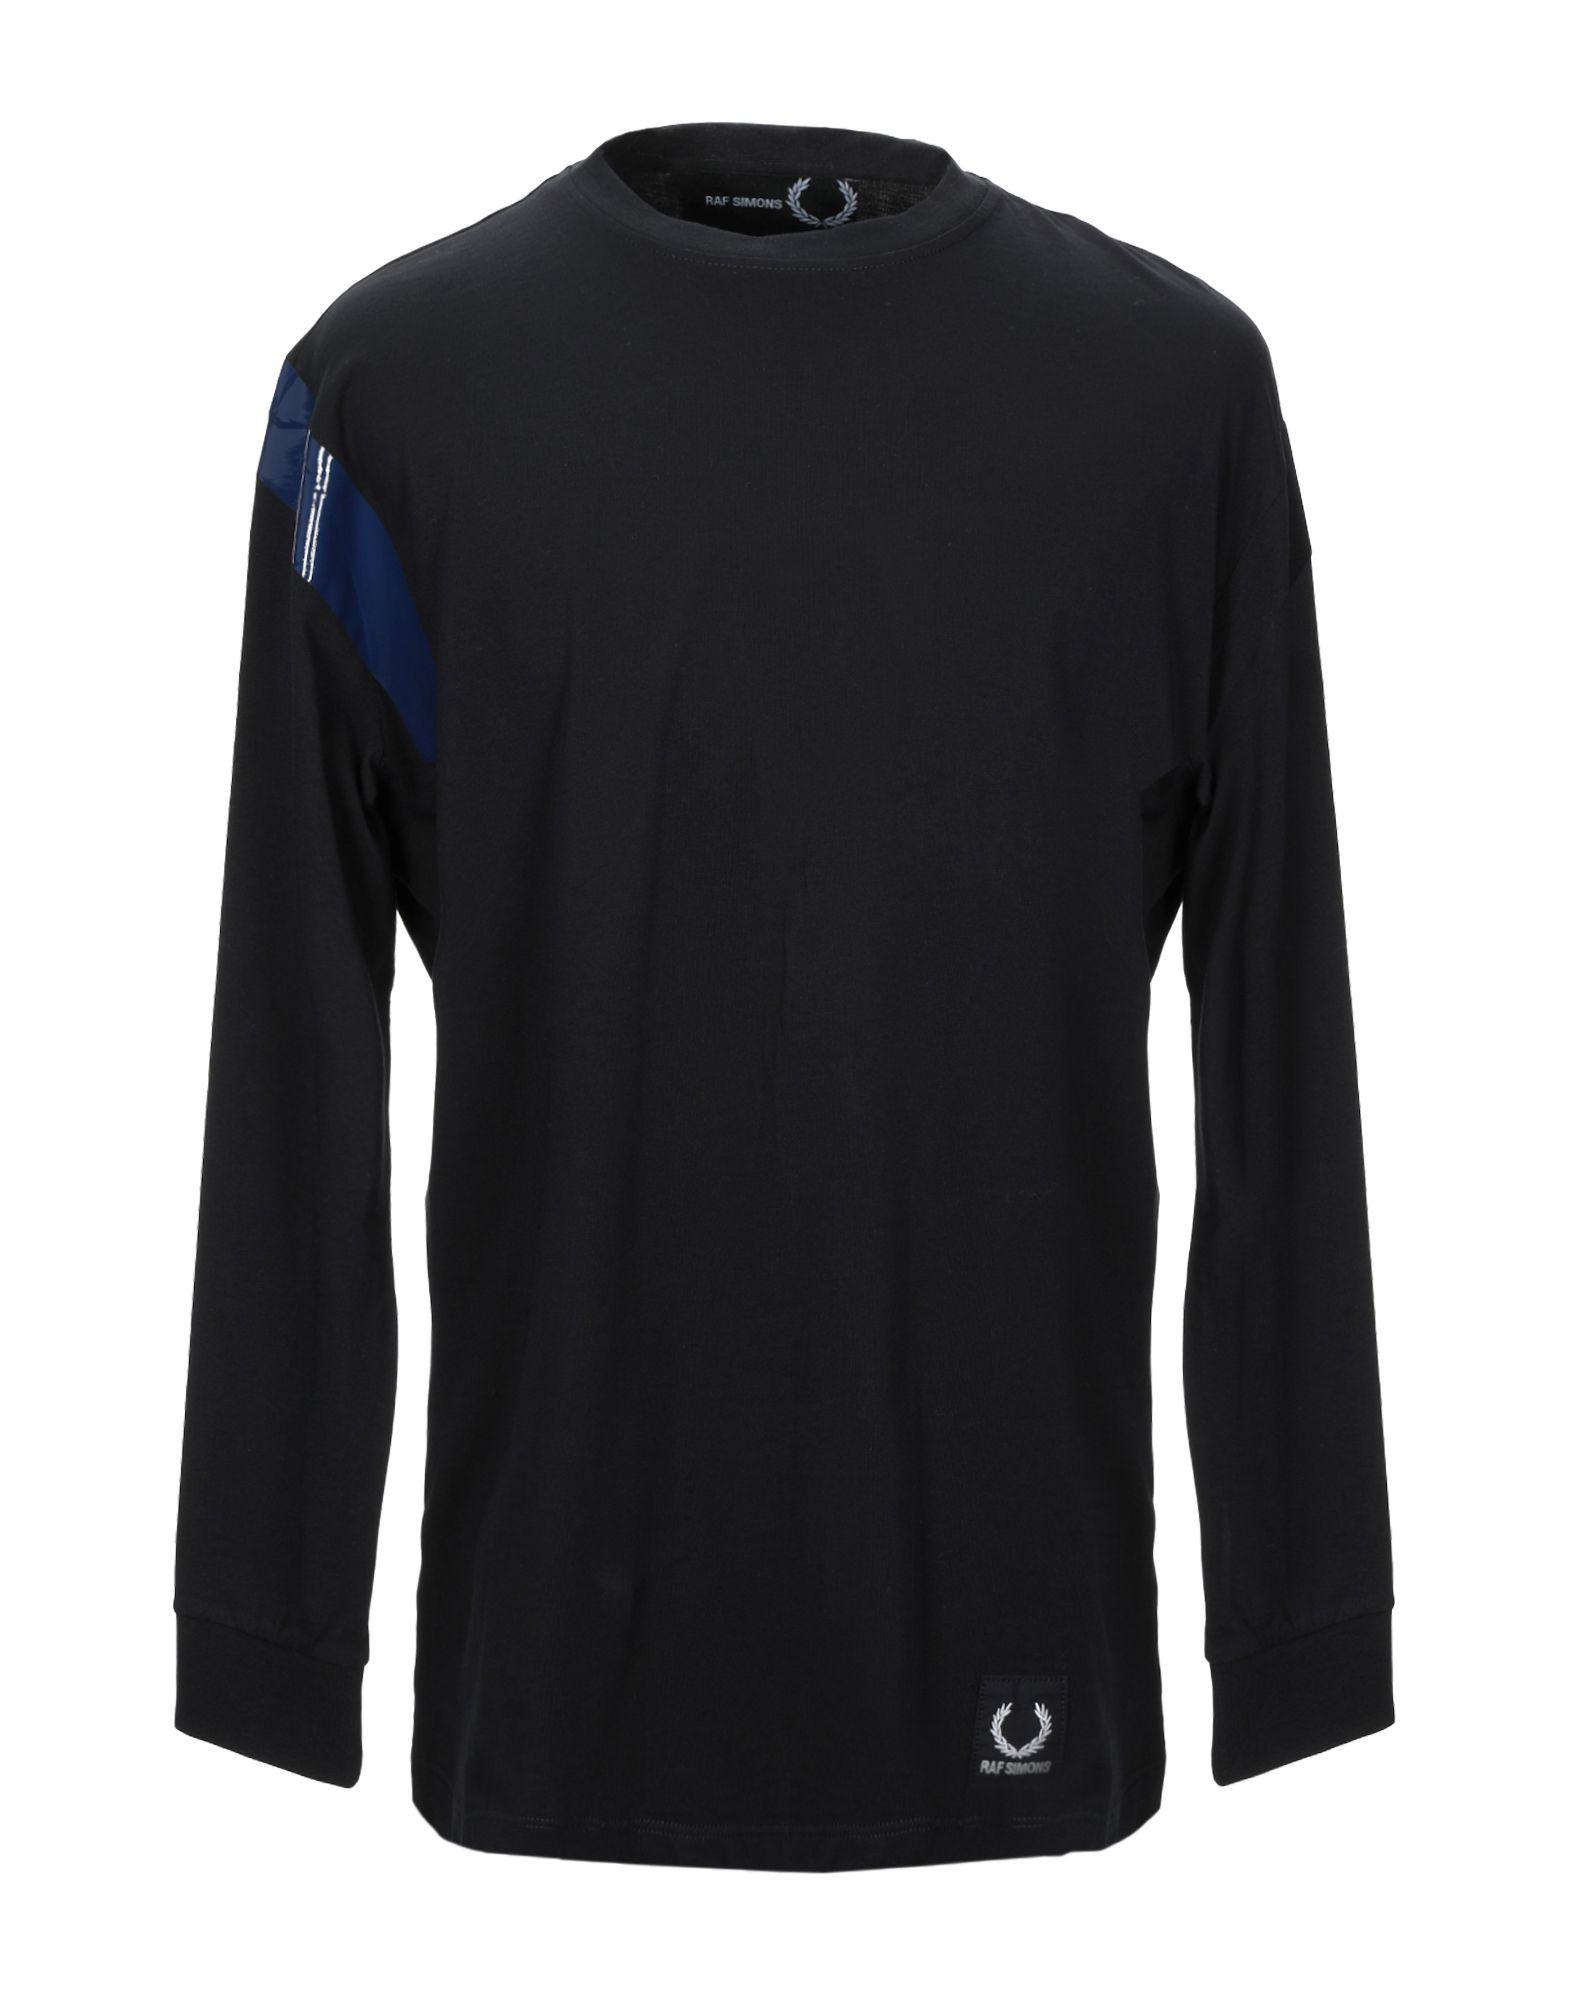 RAF SIMONS FRED PERRY Футболка raf simons футболка